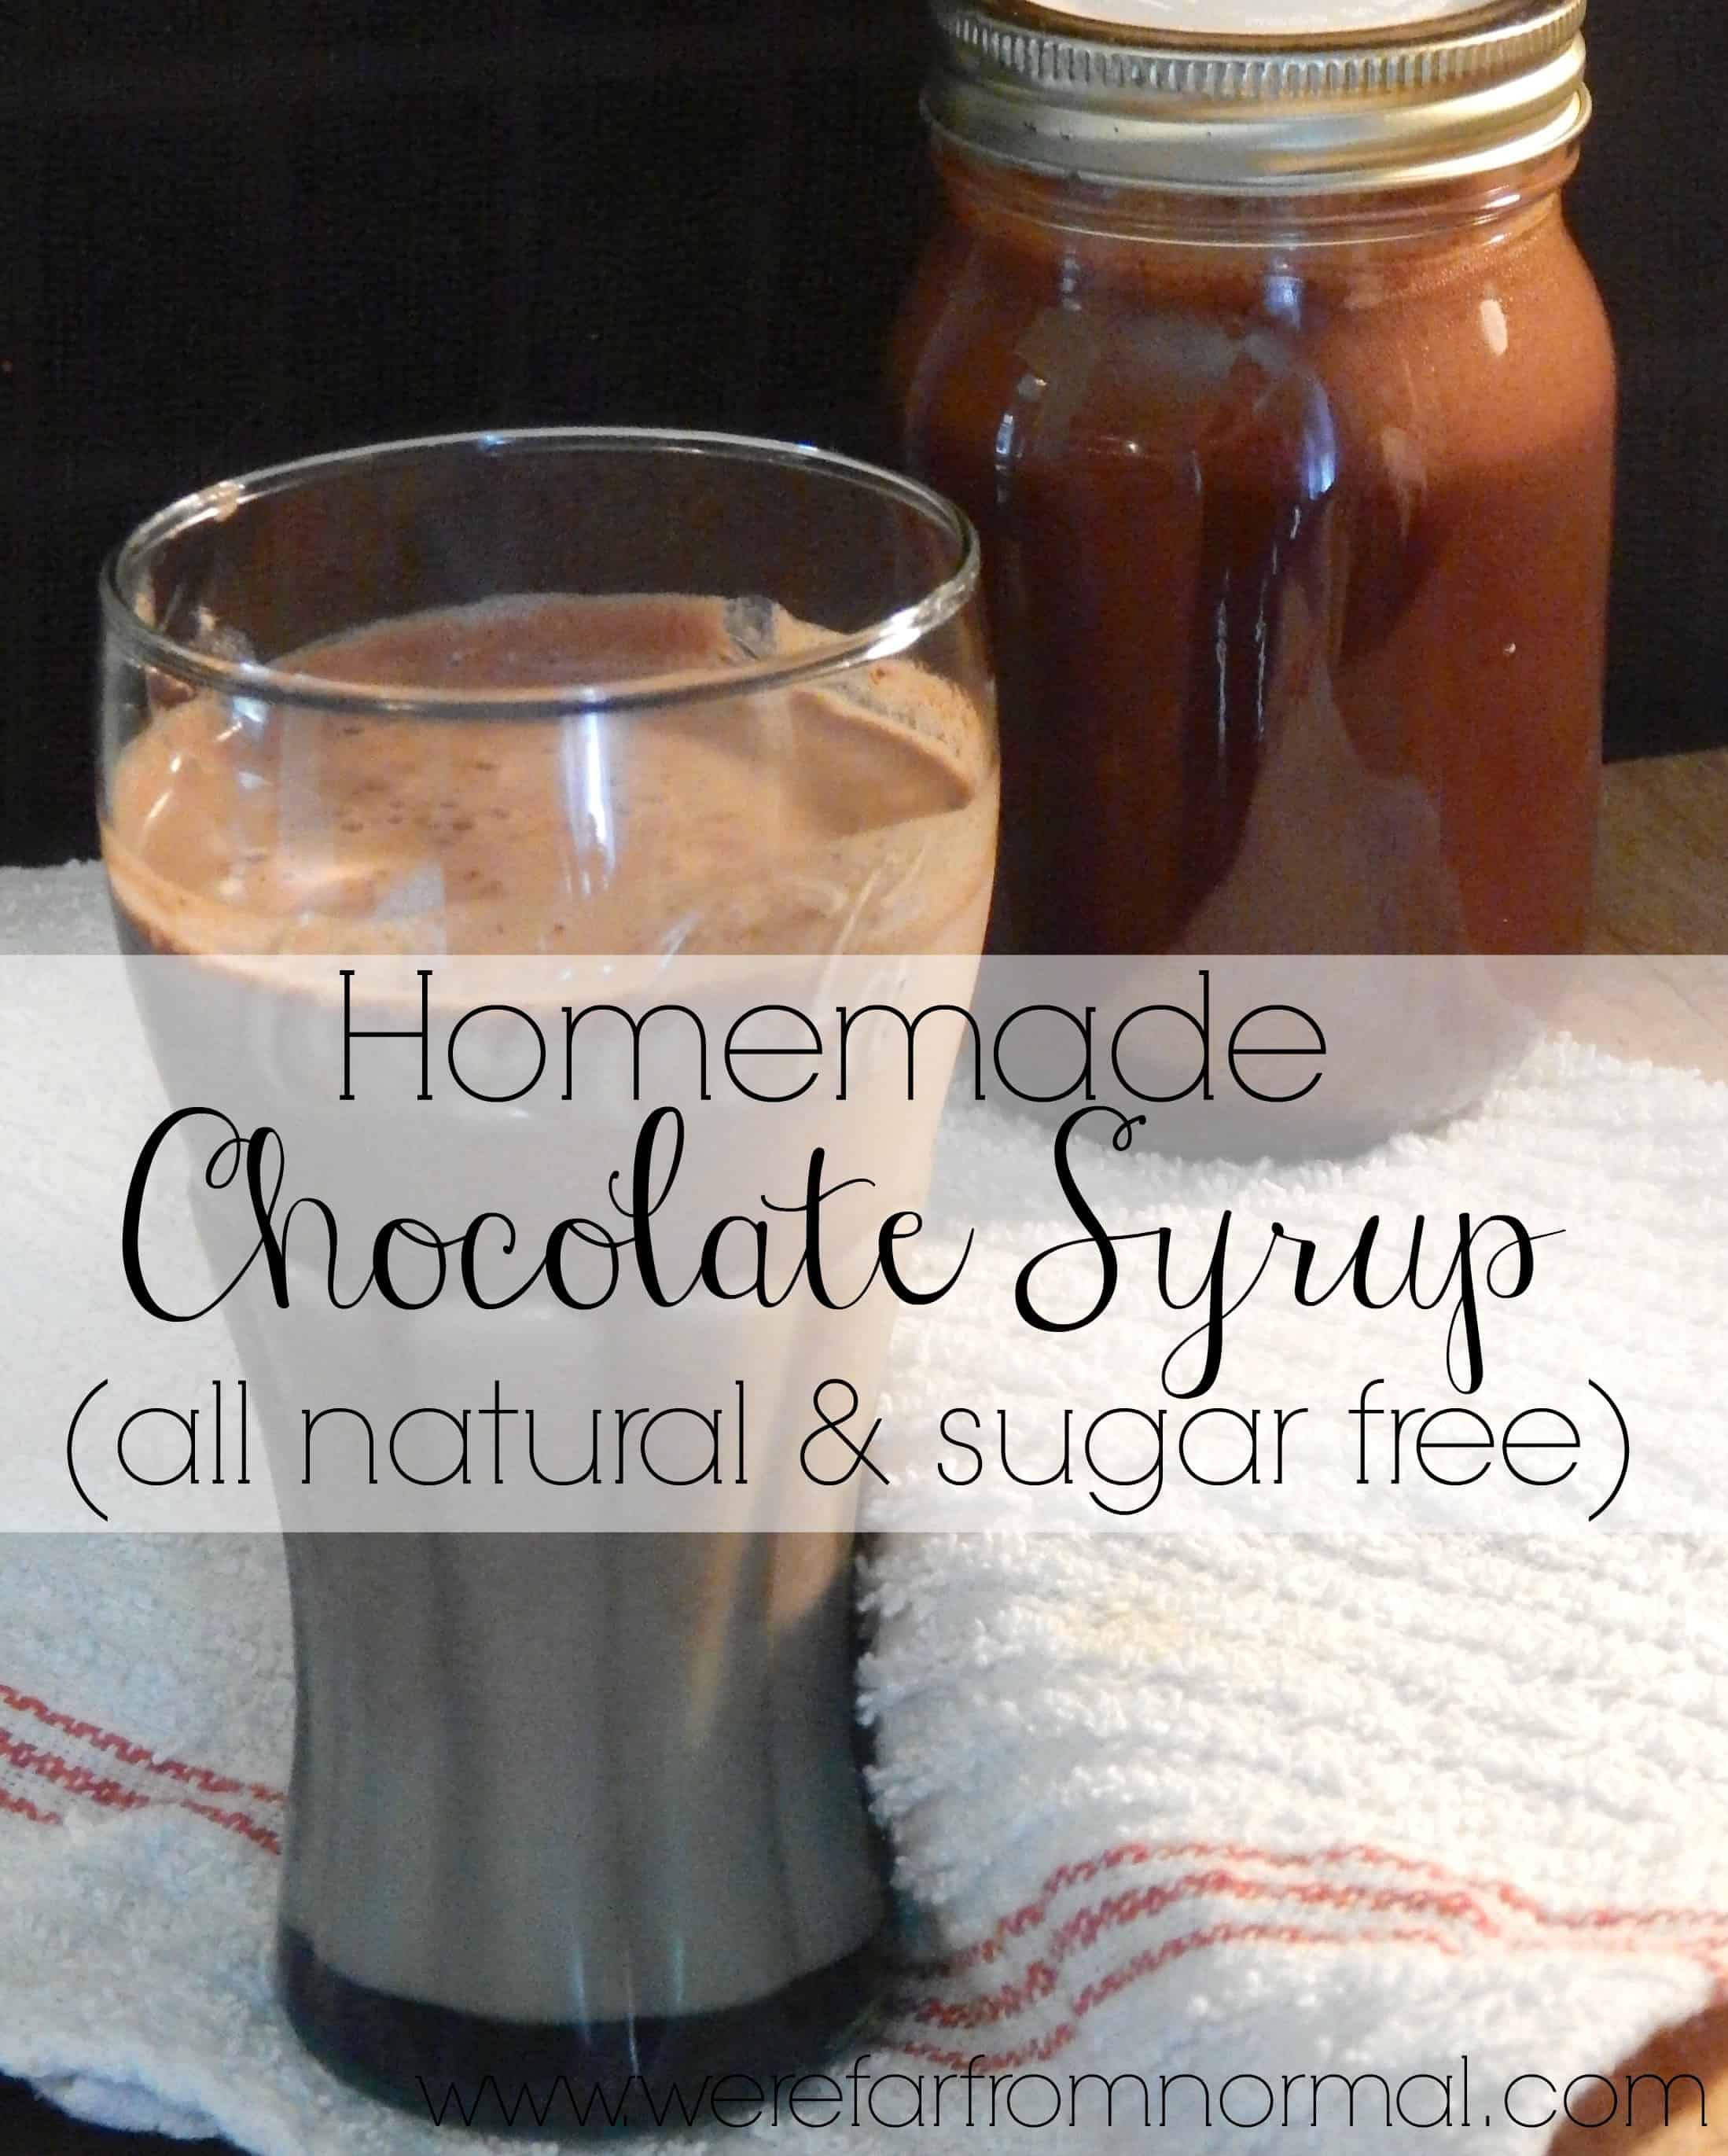 Homemade Chocolate Syrup (Sugar free and All Natural!)